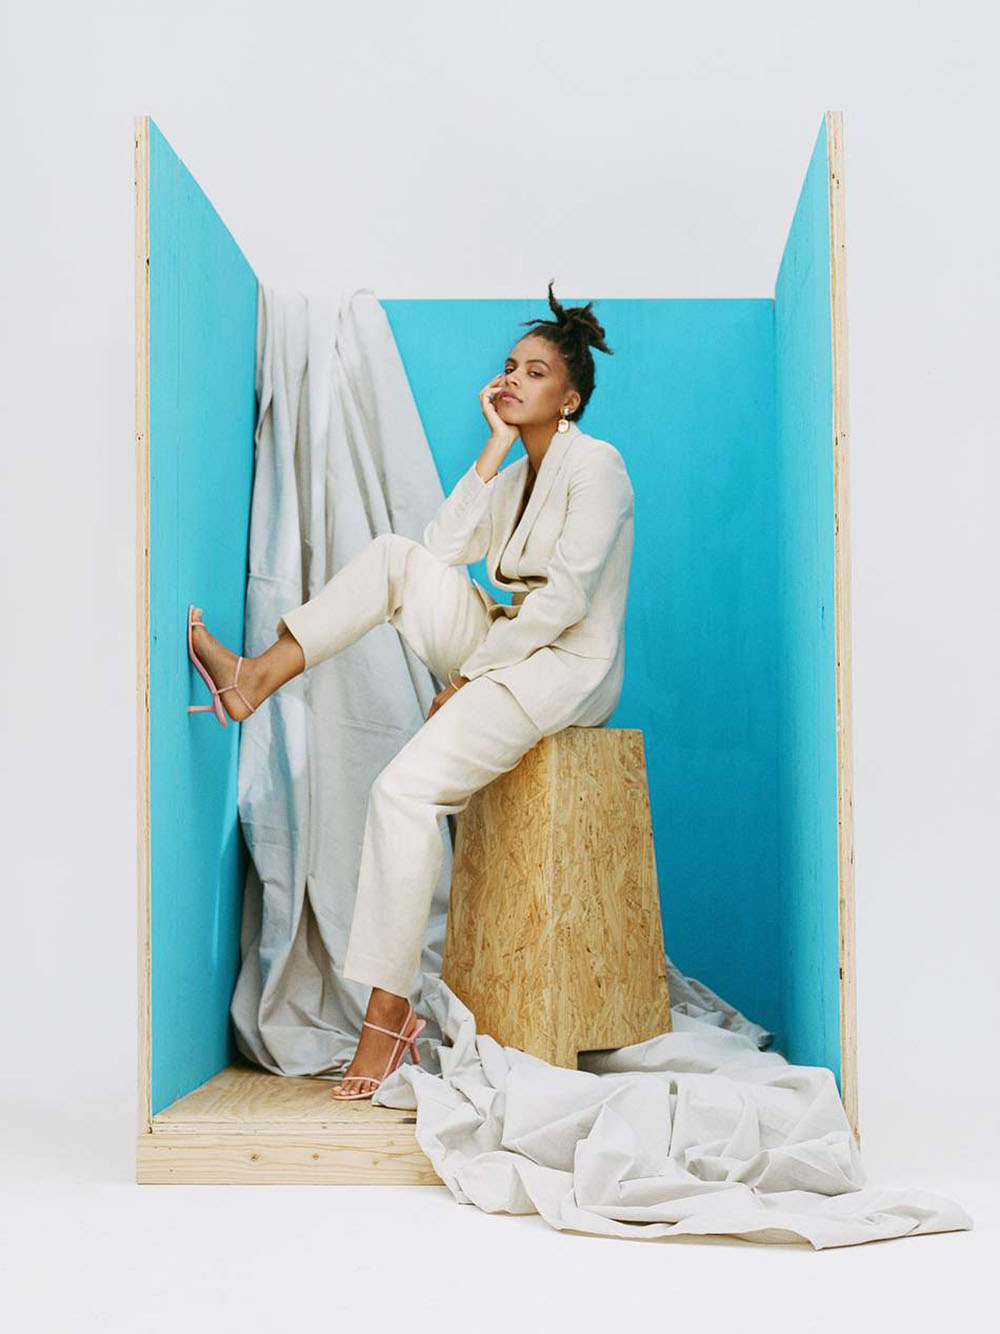 Porter Edit June 14th, 2019 cover by Camila Falquez